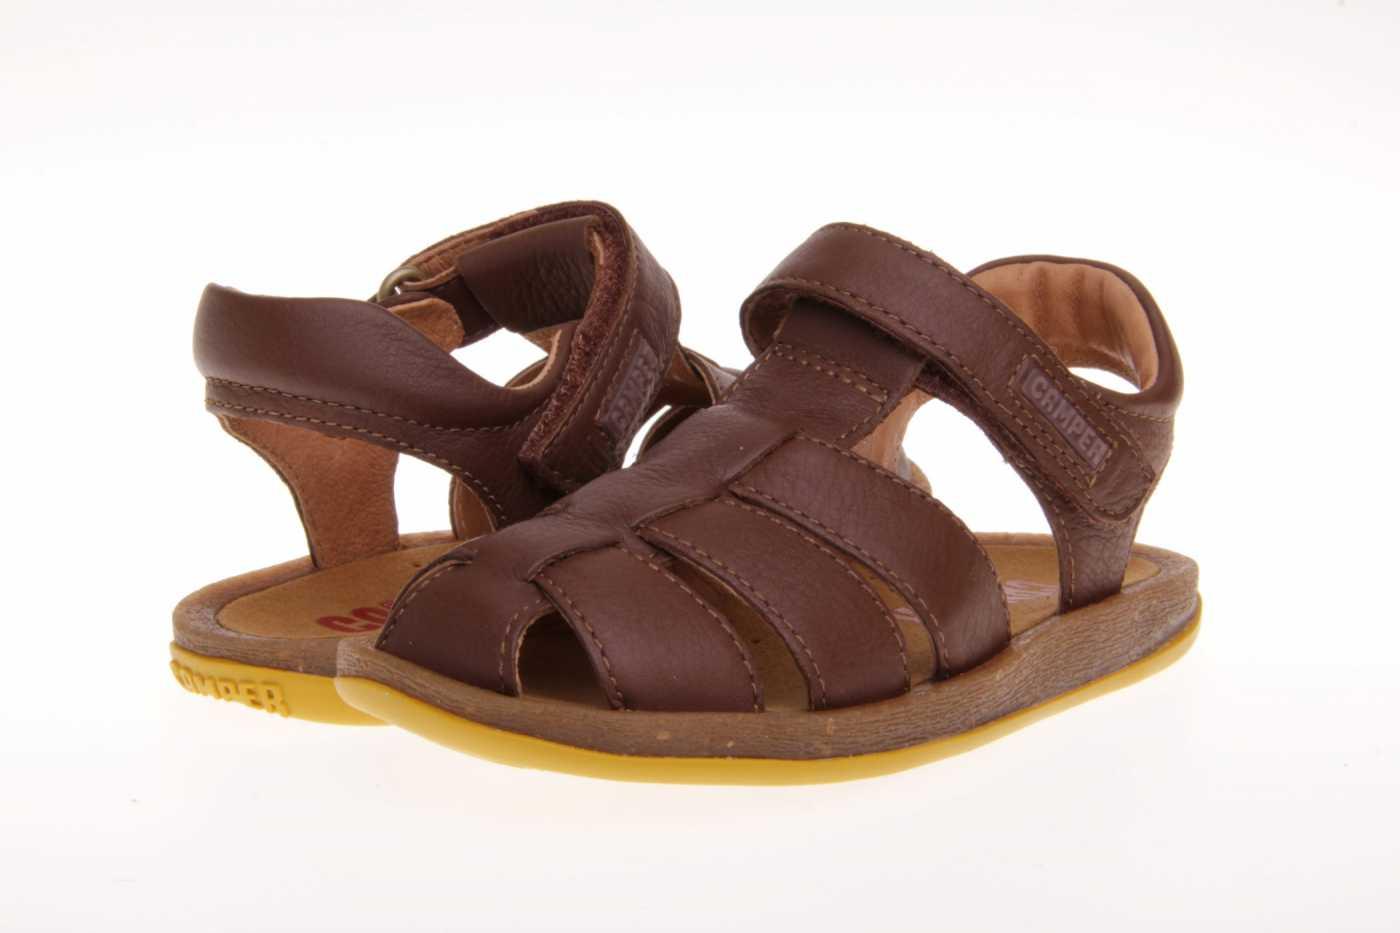 9db9cb79d0a Comprar zapato tipo JOVEN NIÑO estilo SANDALIA COLOR AZUL PIEL ...